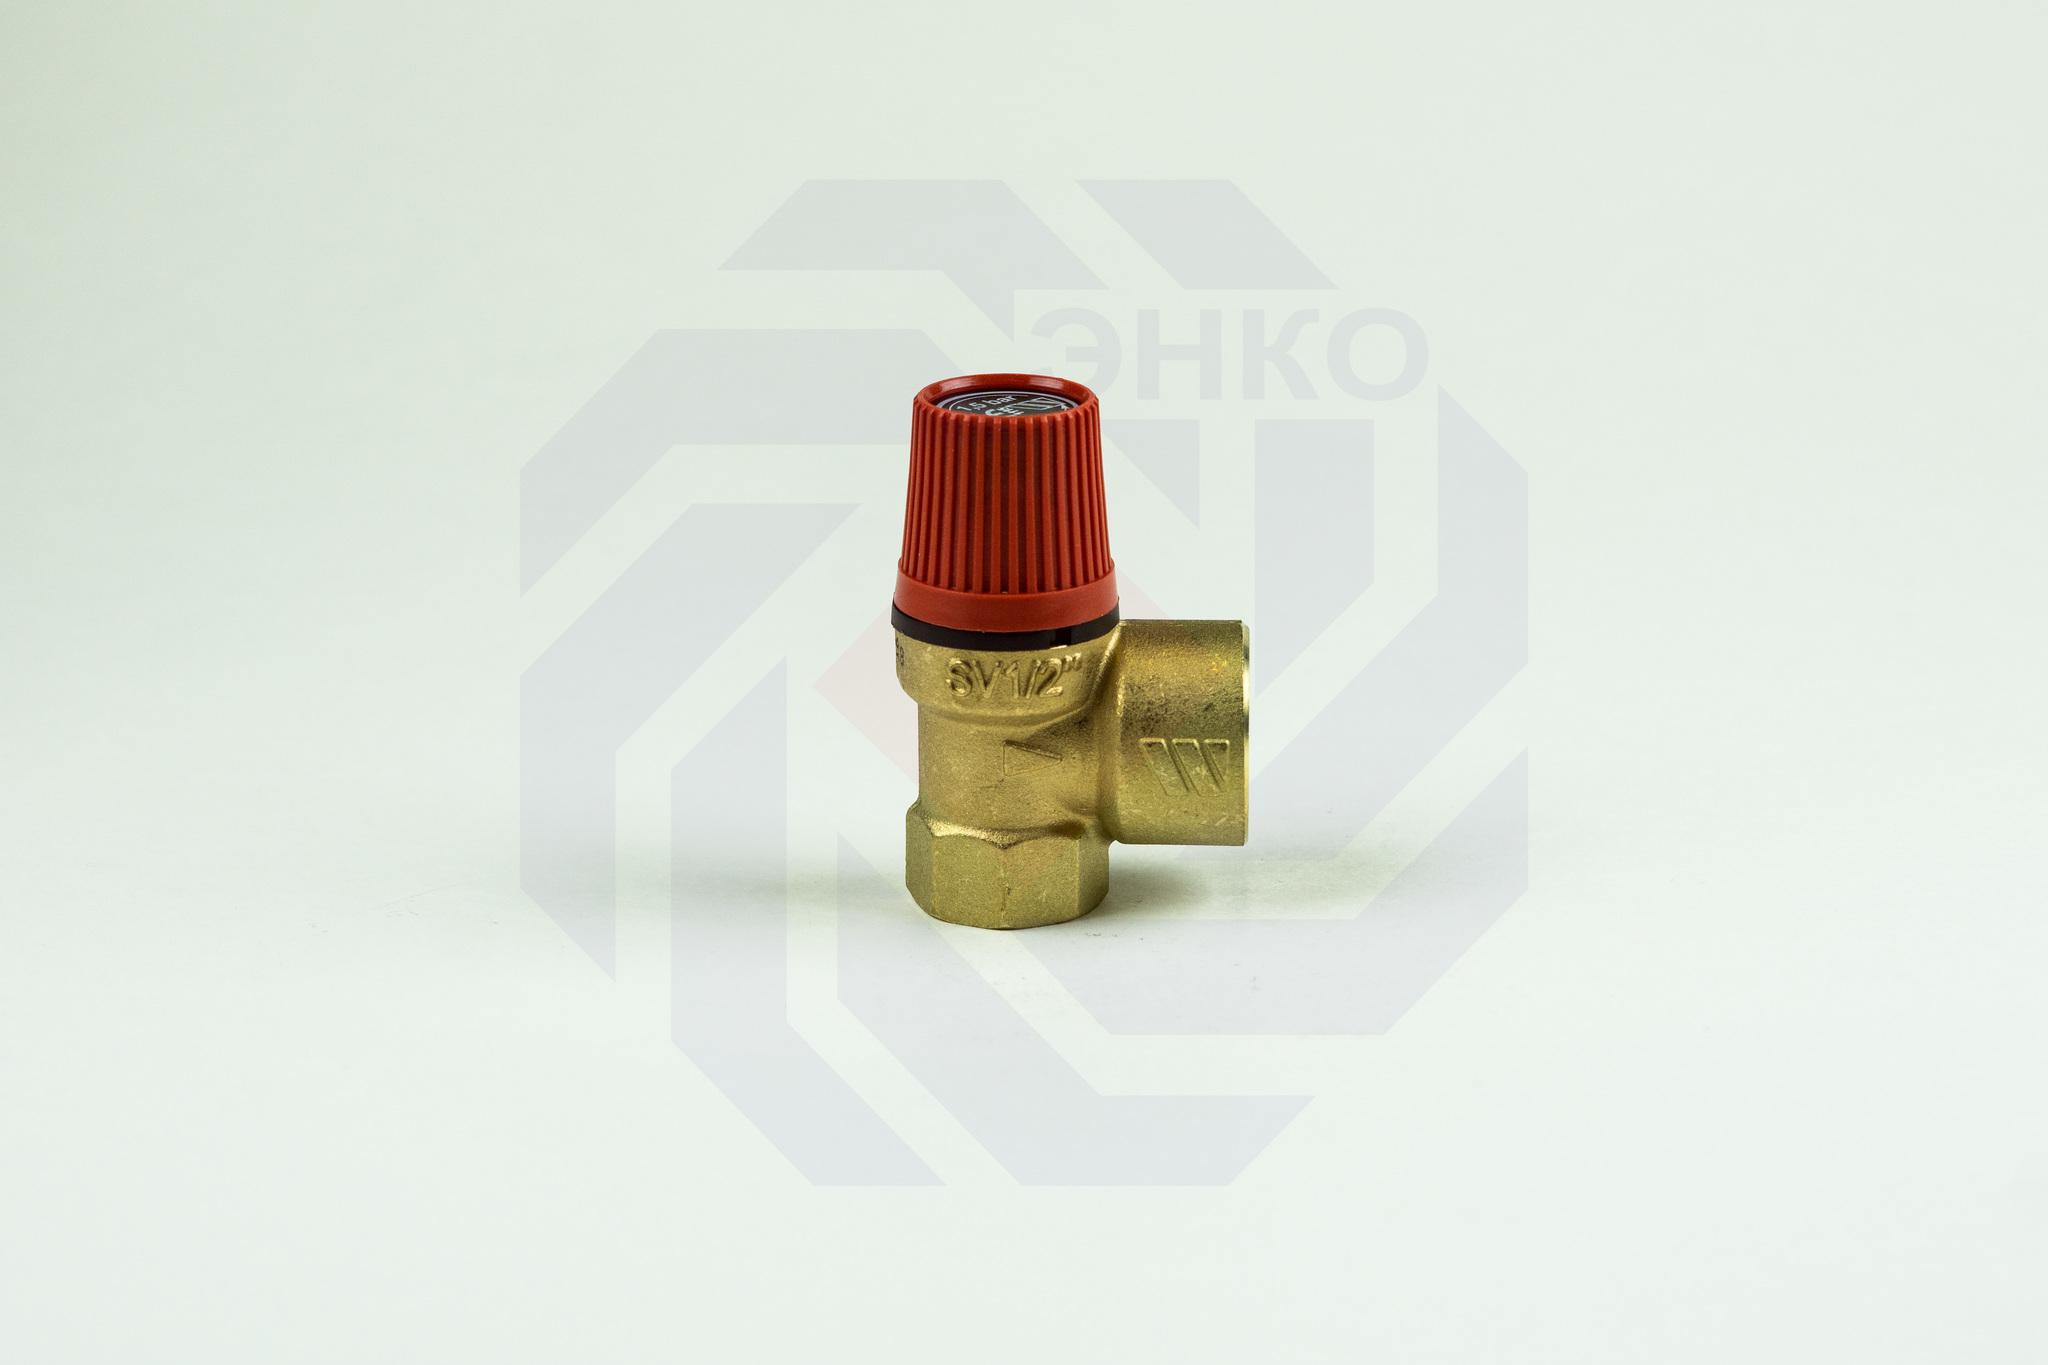 Клапан предохранительный WATTS SVH 1,5 бар ½